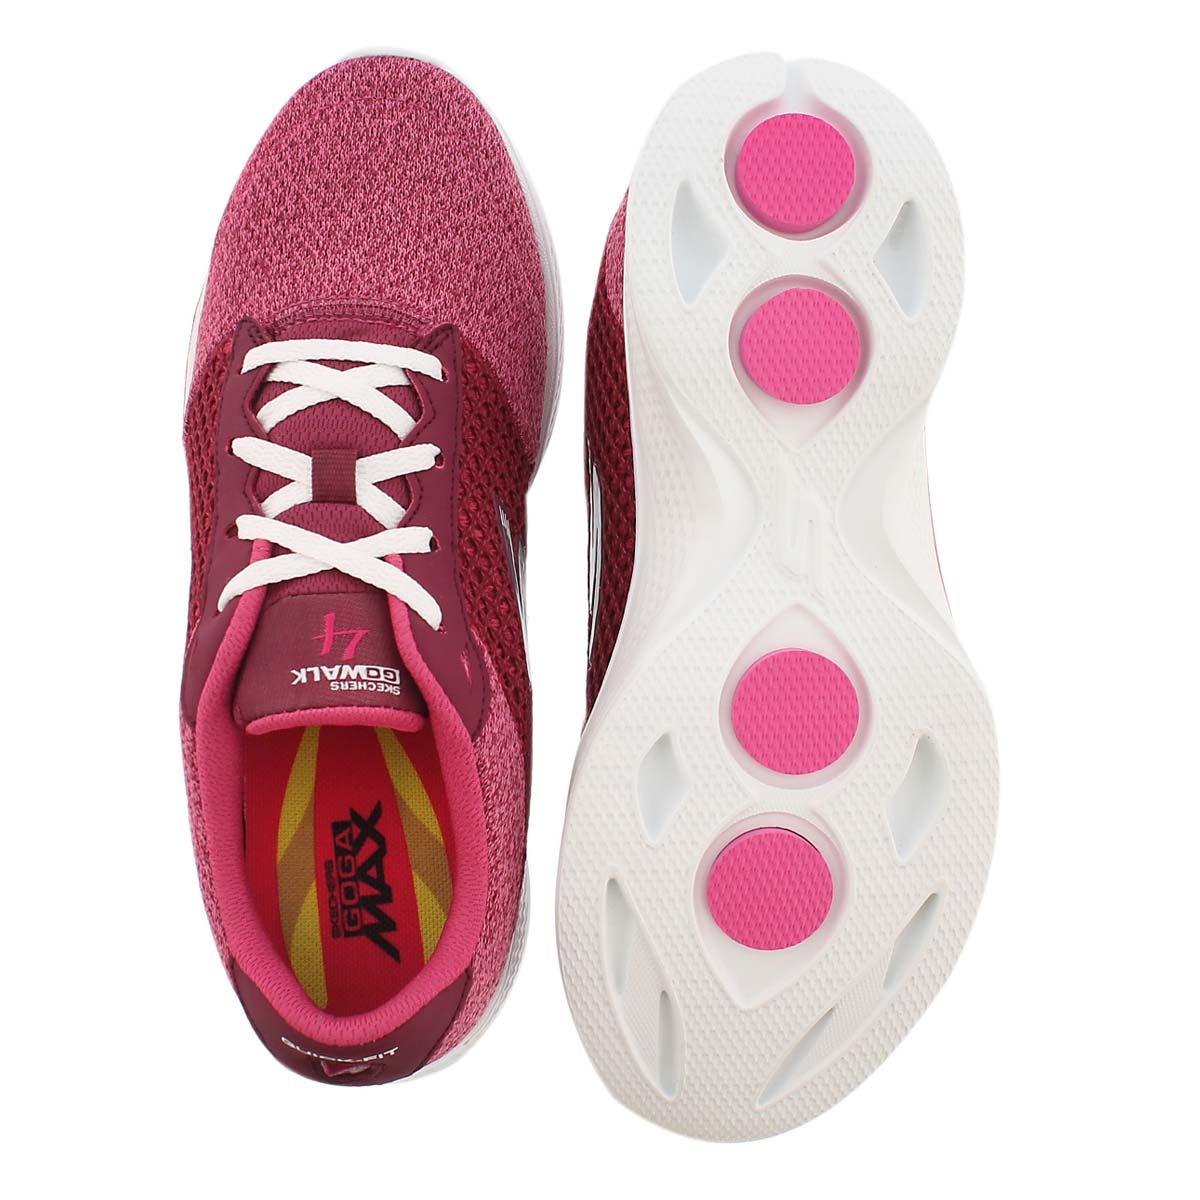 Chaussure de marche GOWalk4, framb, fem